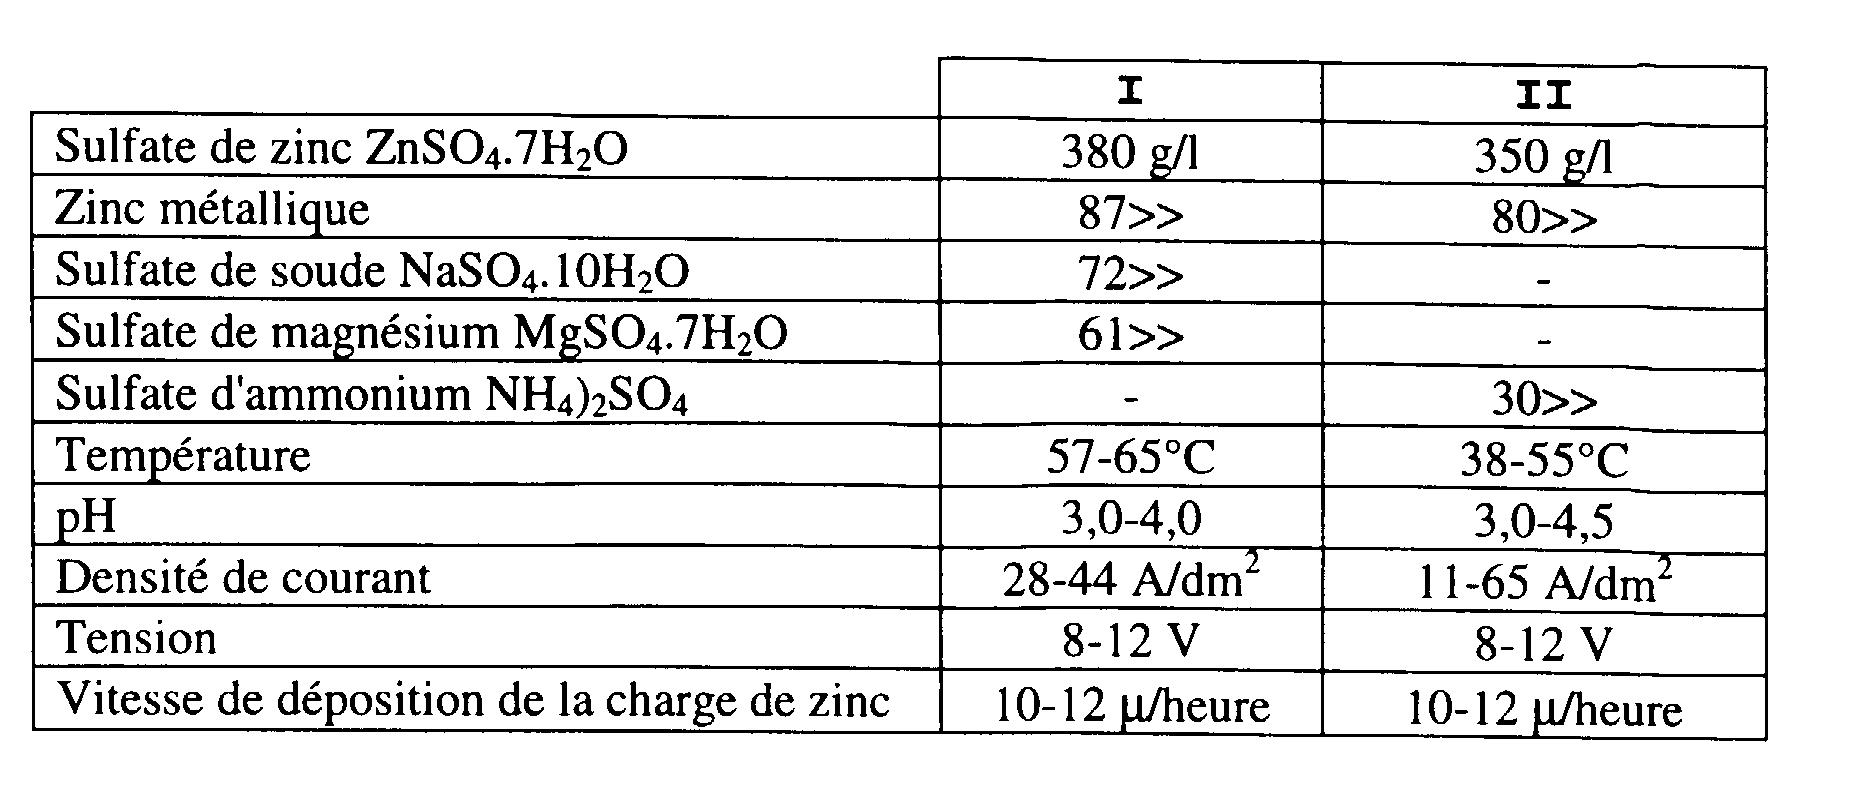 EP1070771A1 - Aqueous acid bath for zinc plating process and